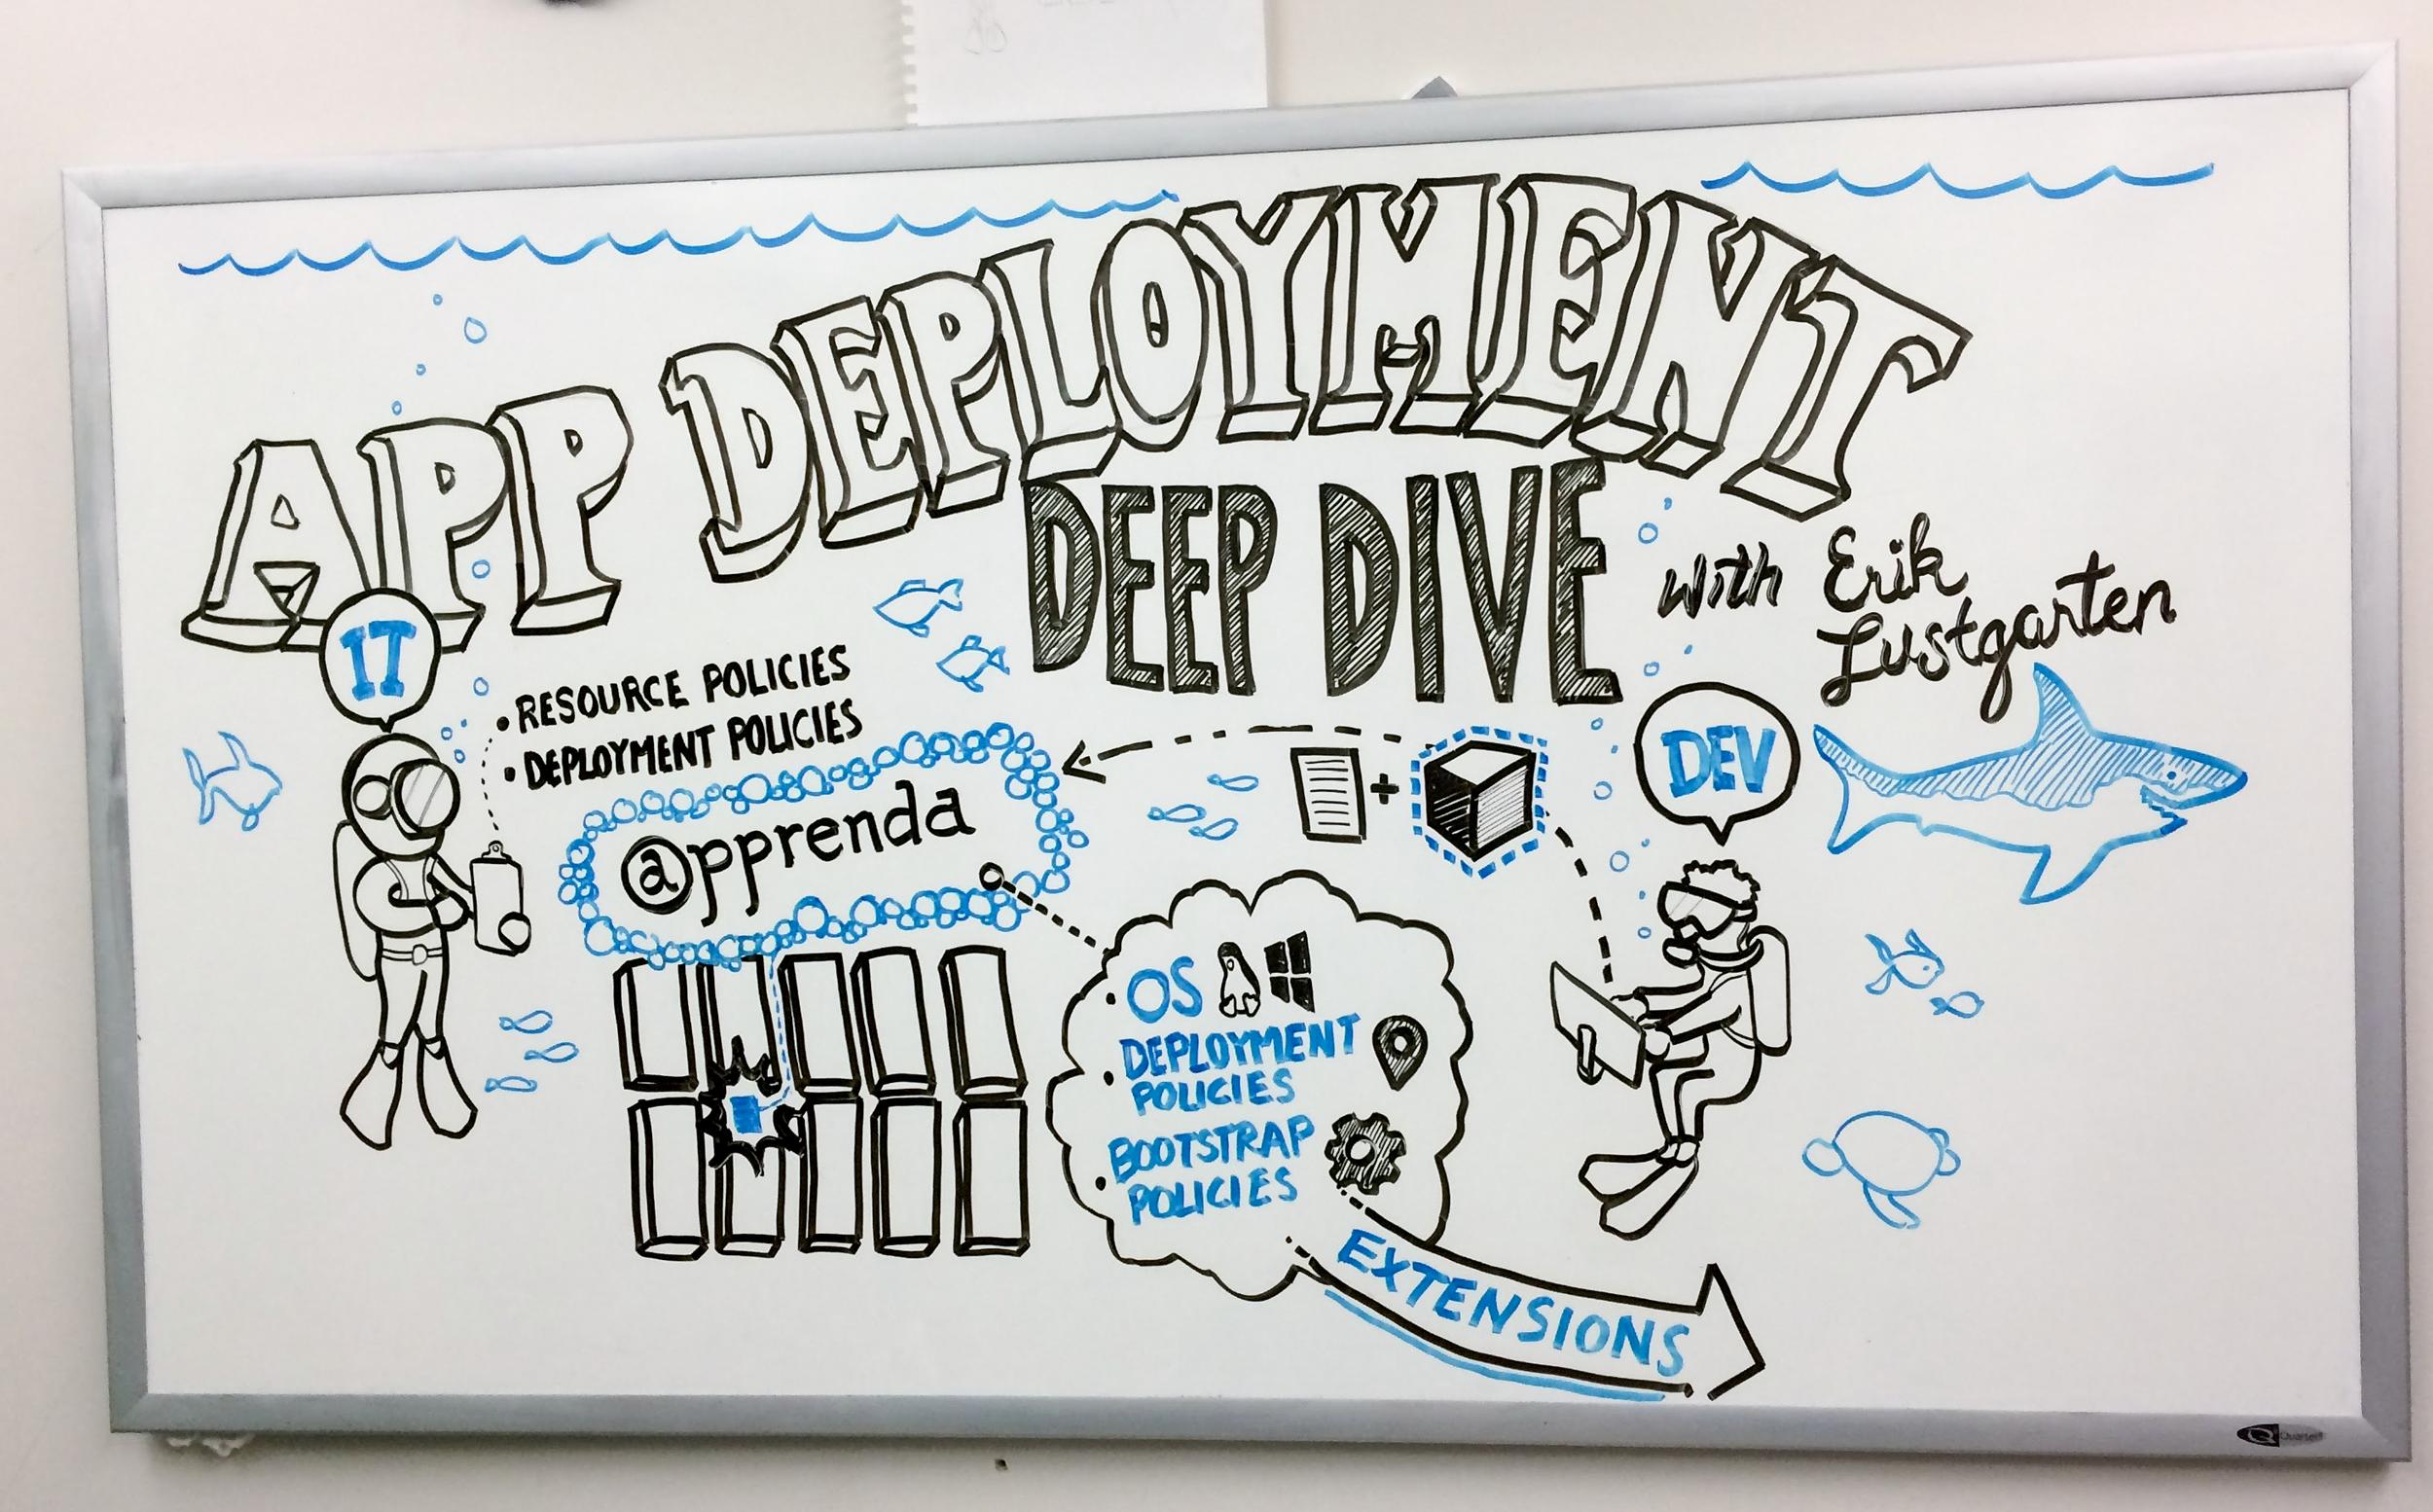 App deployment deep dive